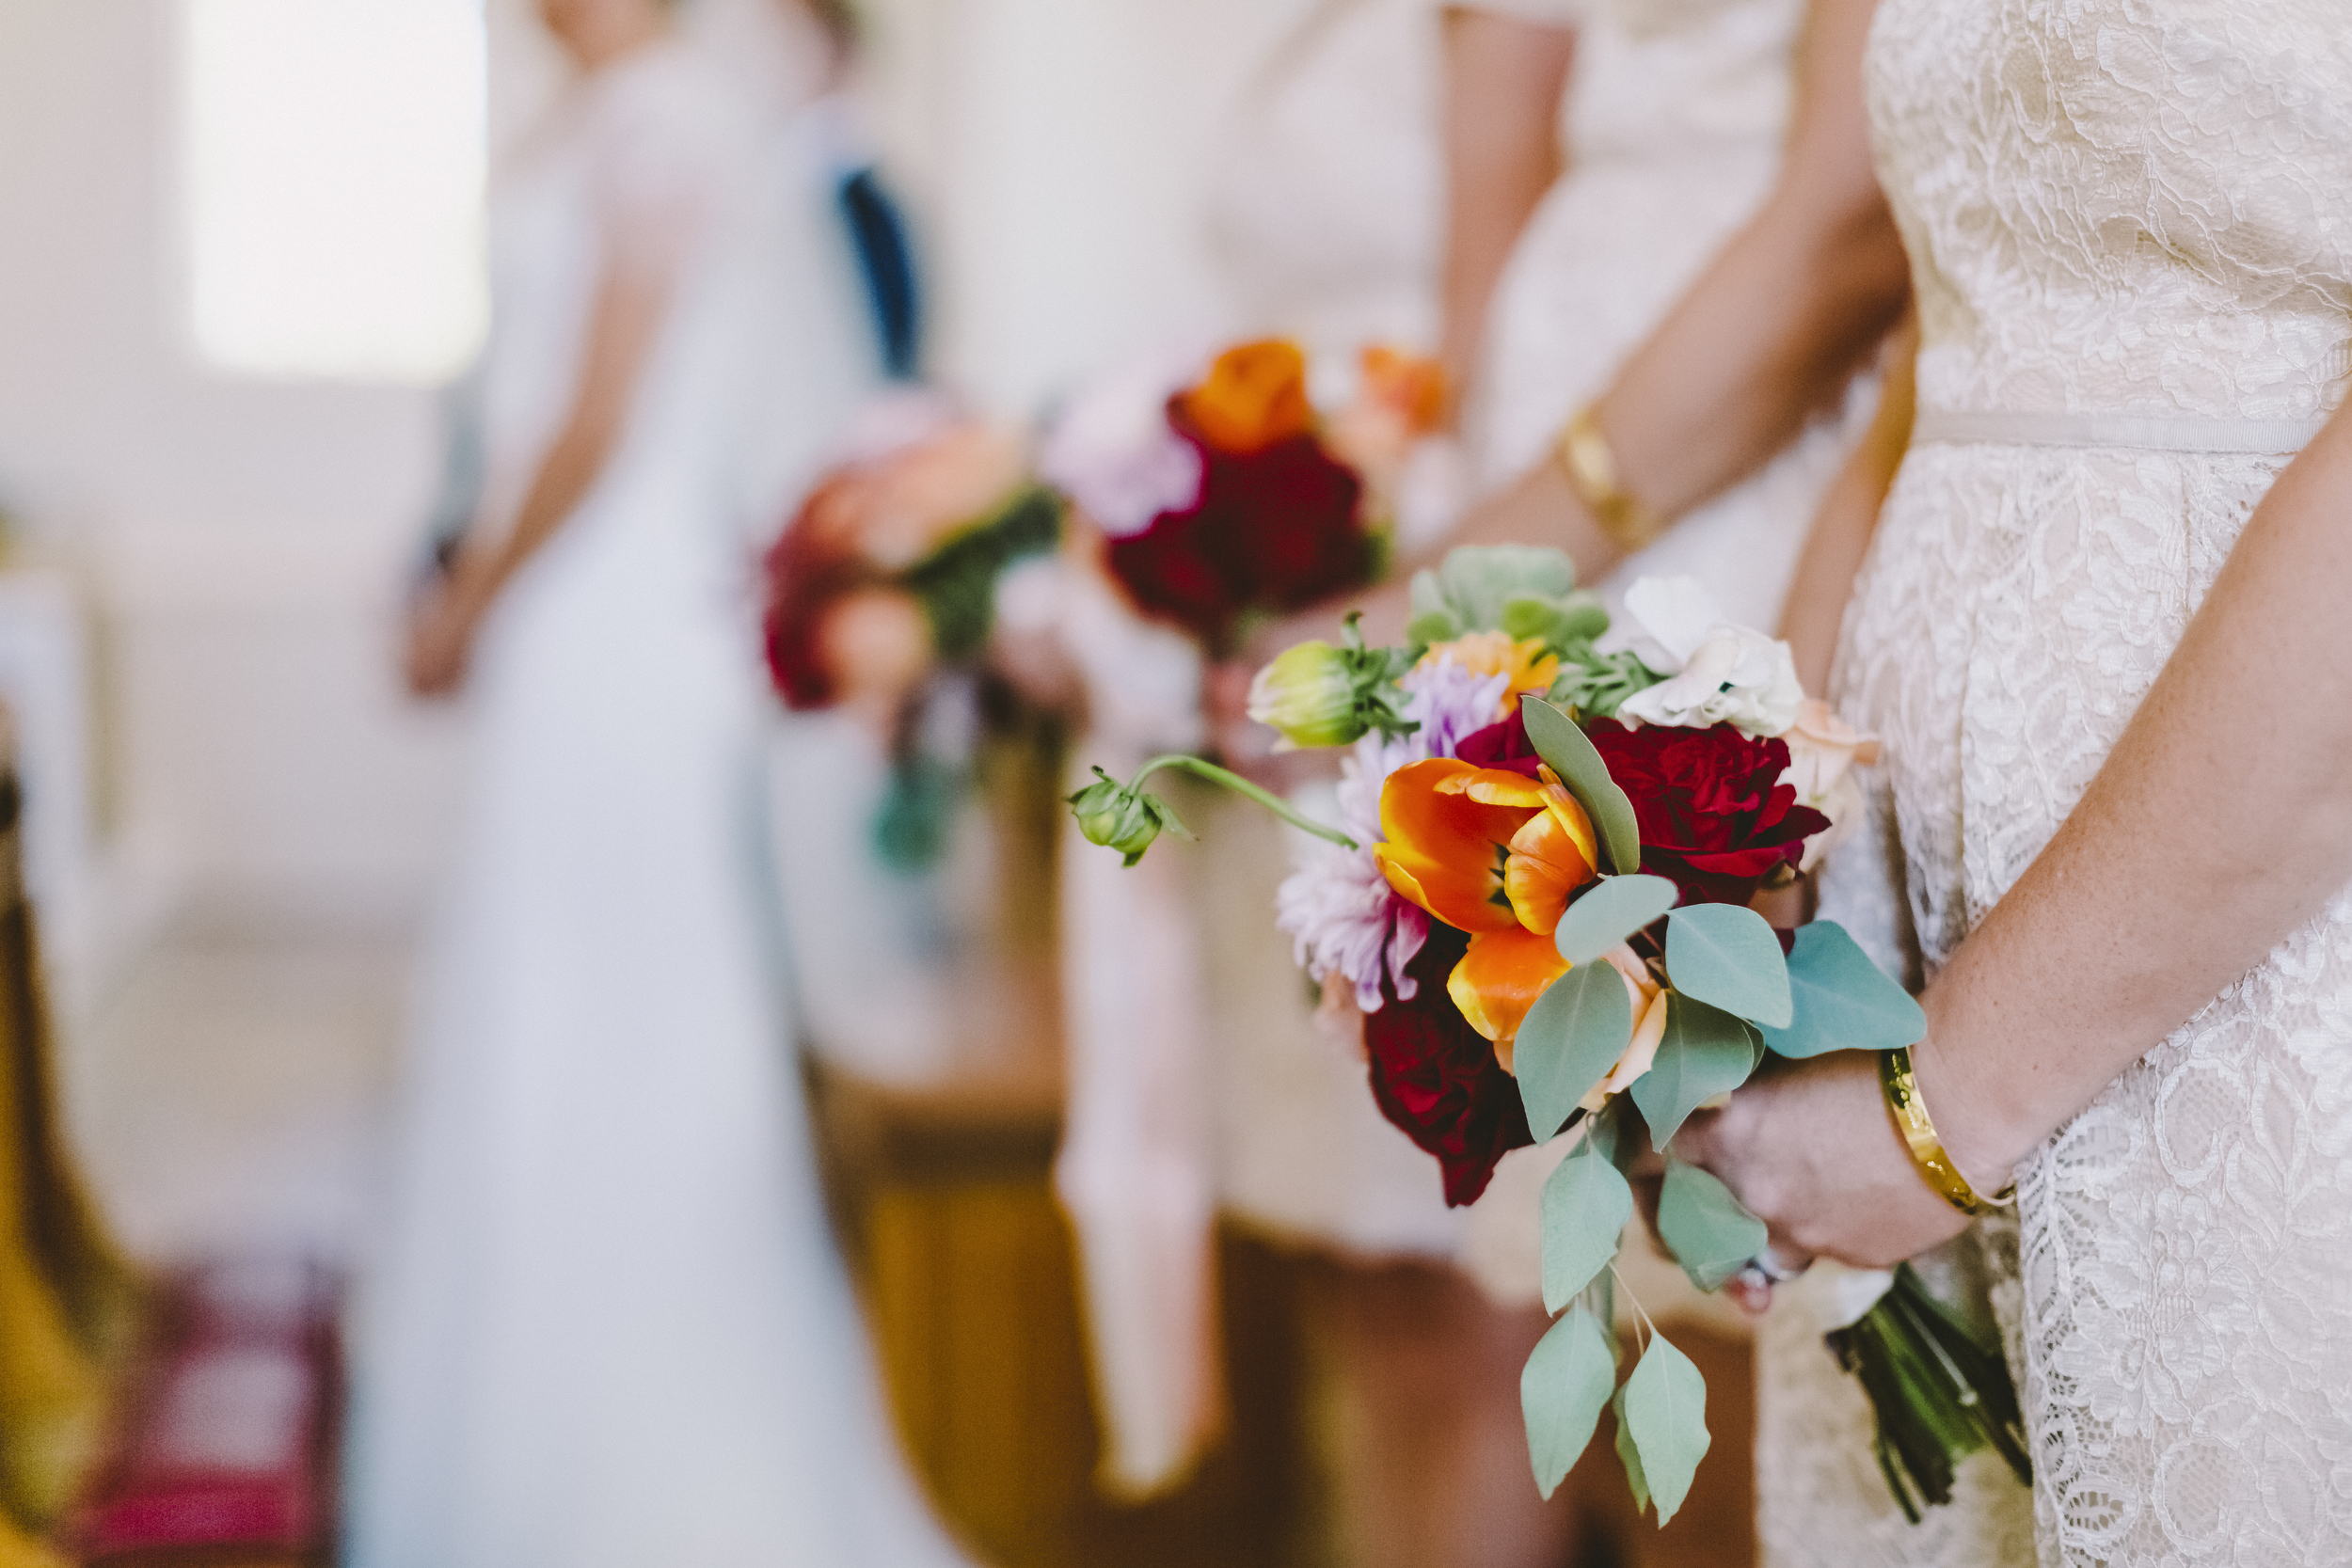 angie-diaz-photography-maui-wedding-mel-matt-36.jpeg